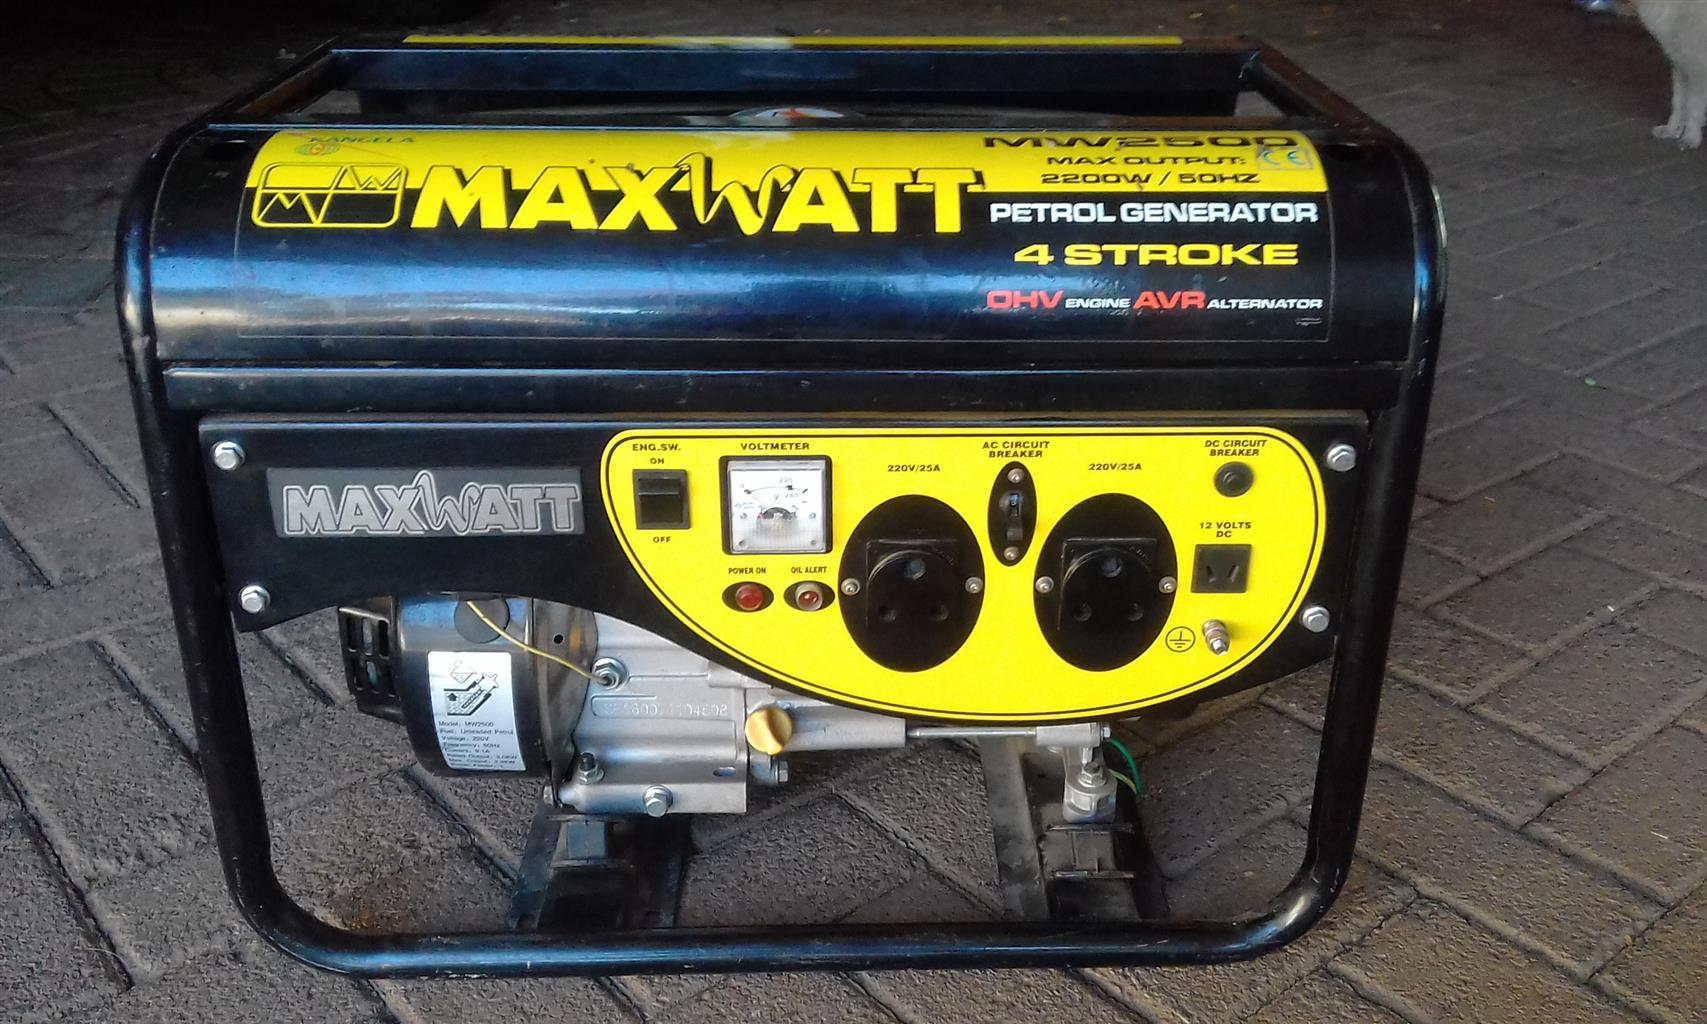 Maxwatt Generator For Sale Junk Mail Voltmeter Ac Wiring Circuits